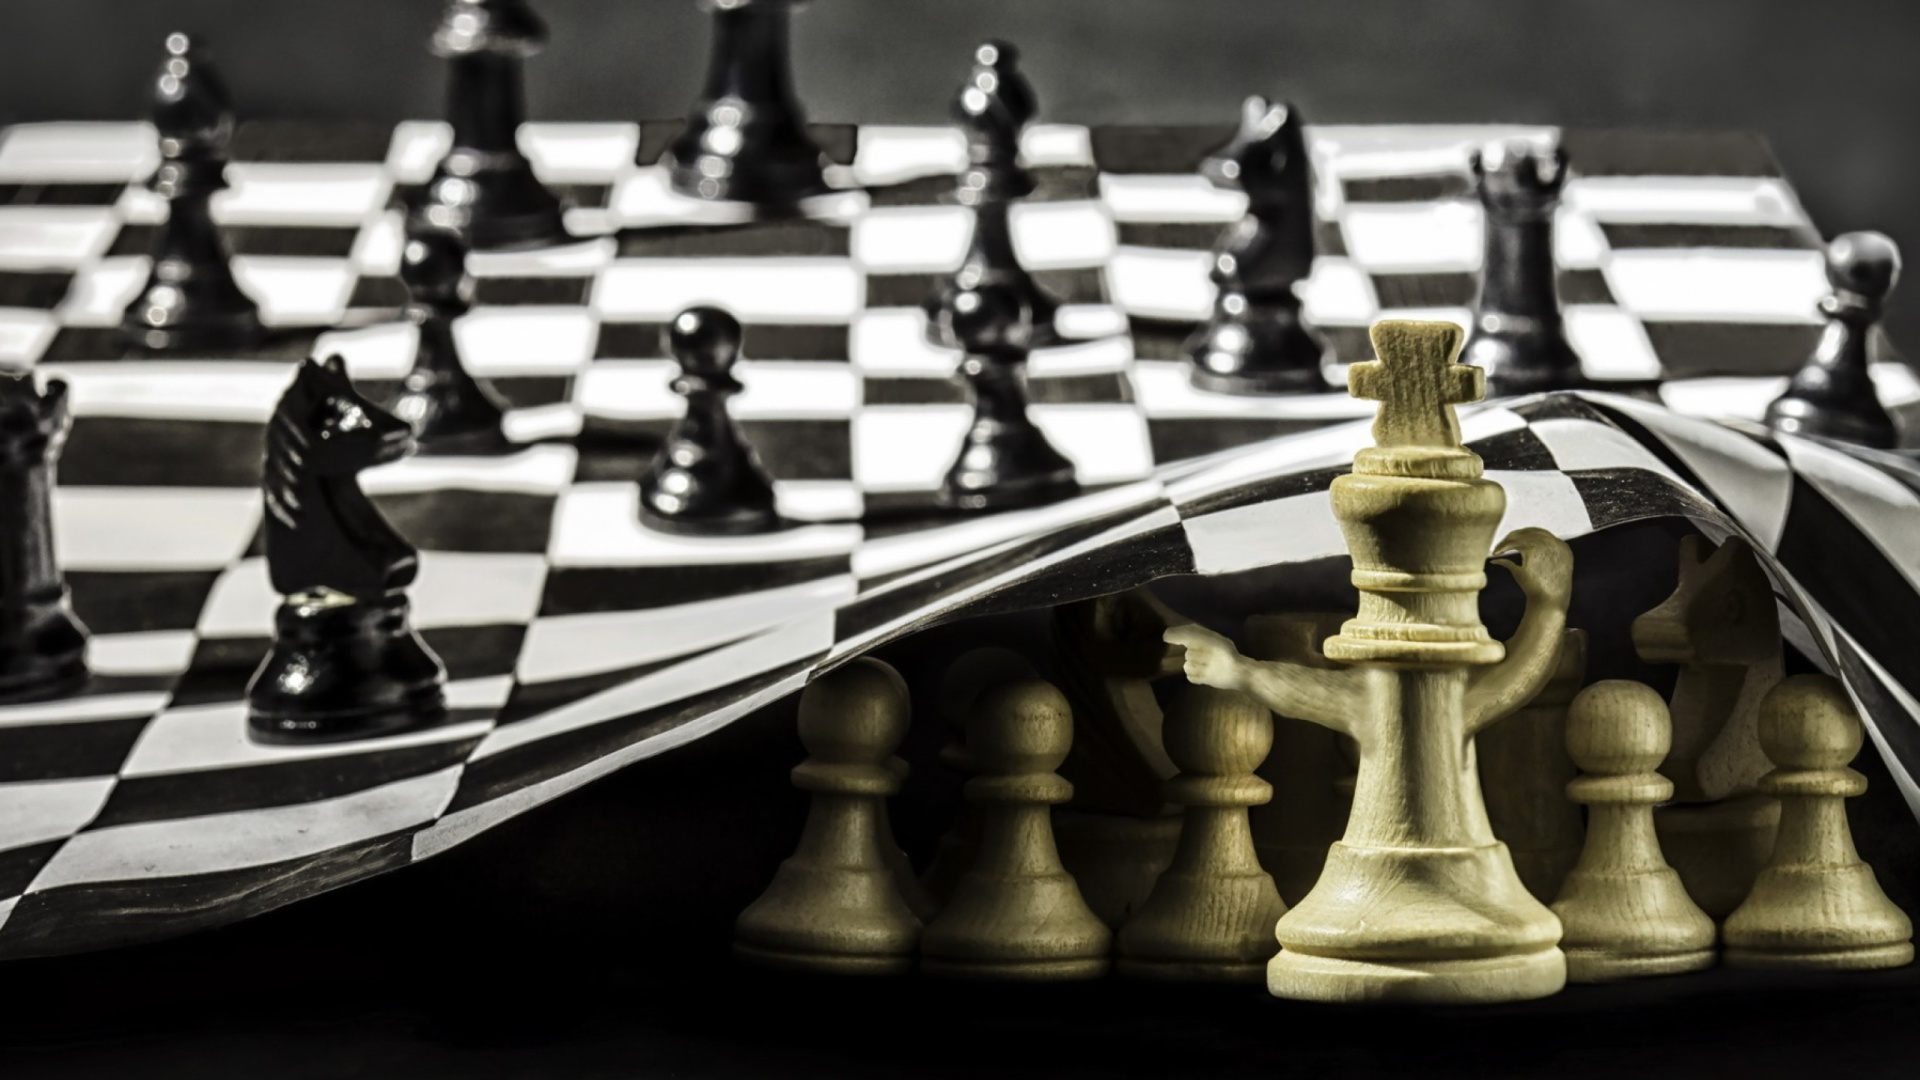 Ставка на шахматы картинка прикольная